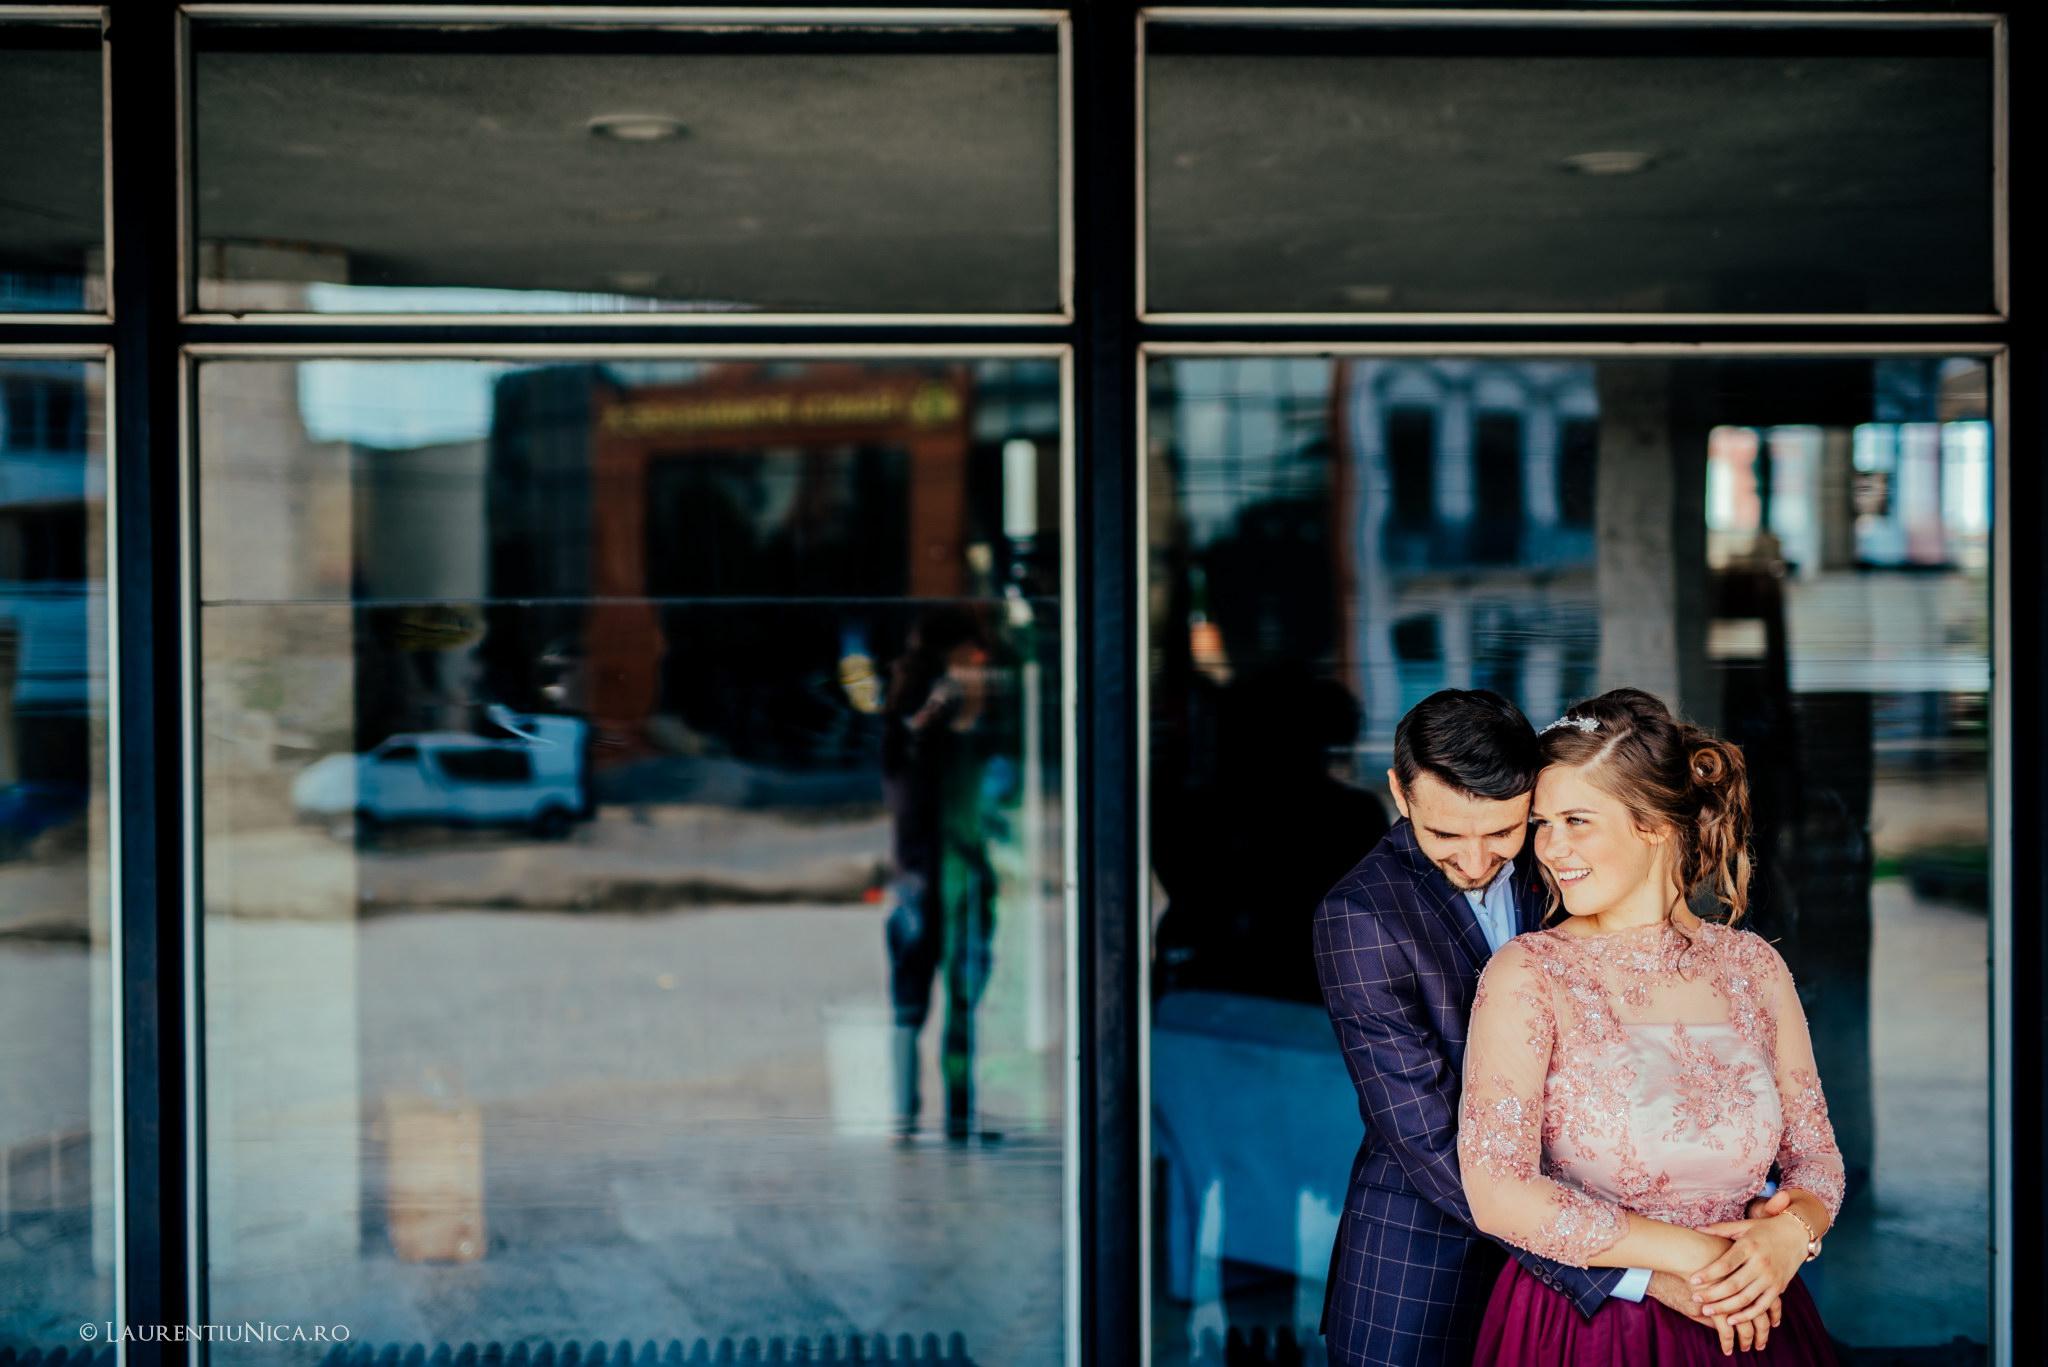 Alina si Andrei fotograf nunta laurentiu nica craiova 11 - Alina & Andrei | Fotografii nunta